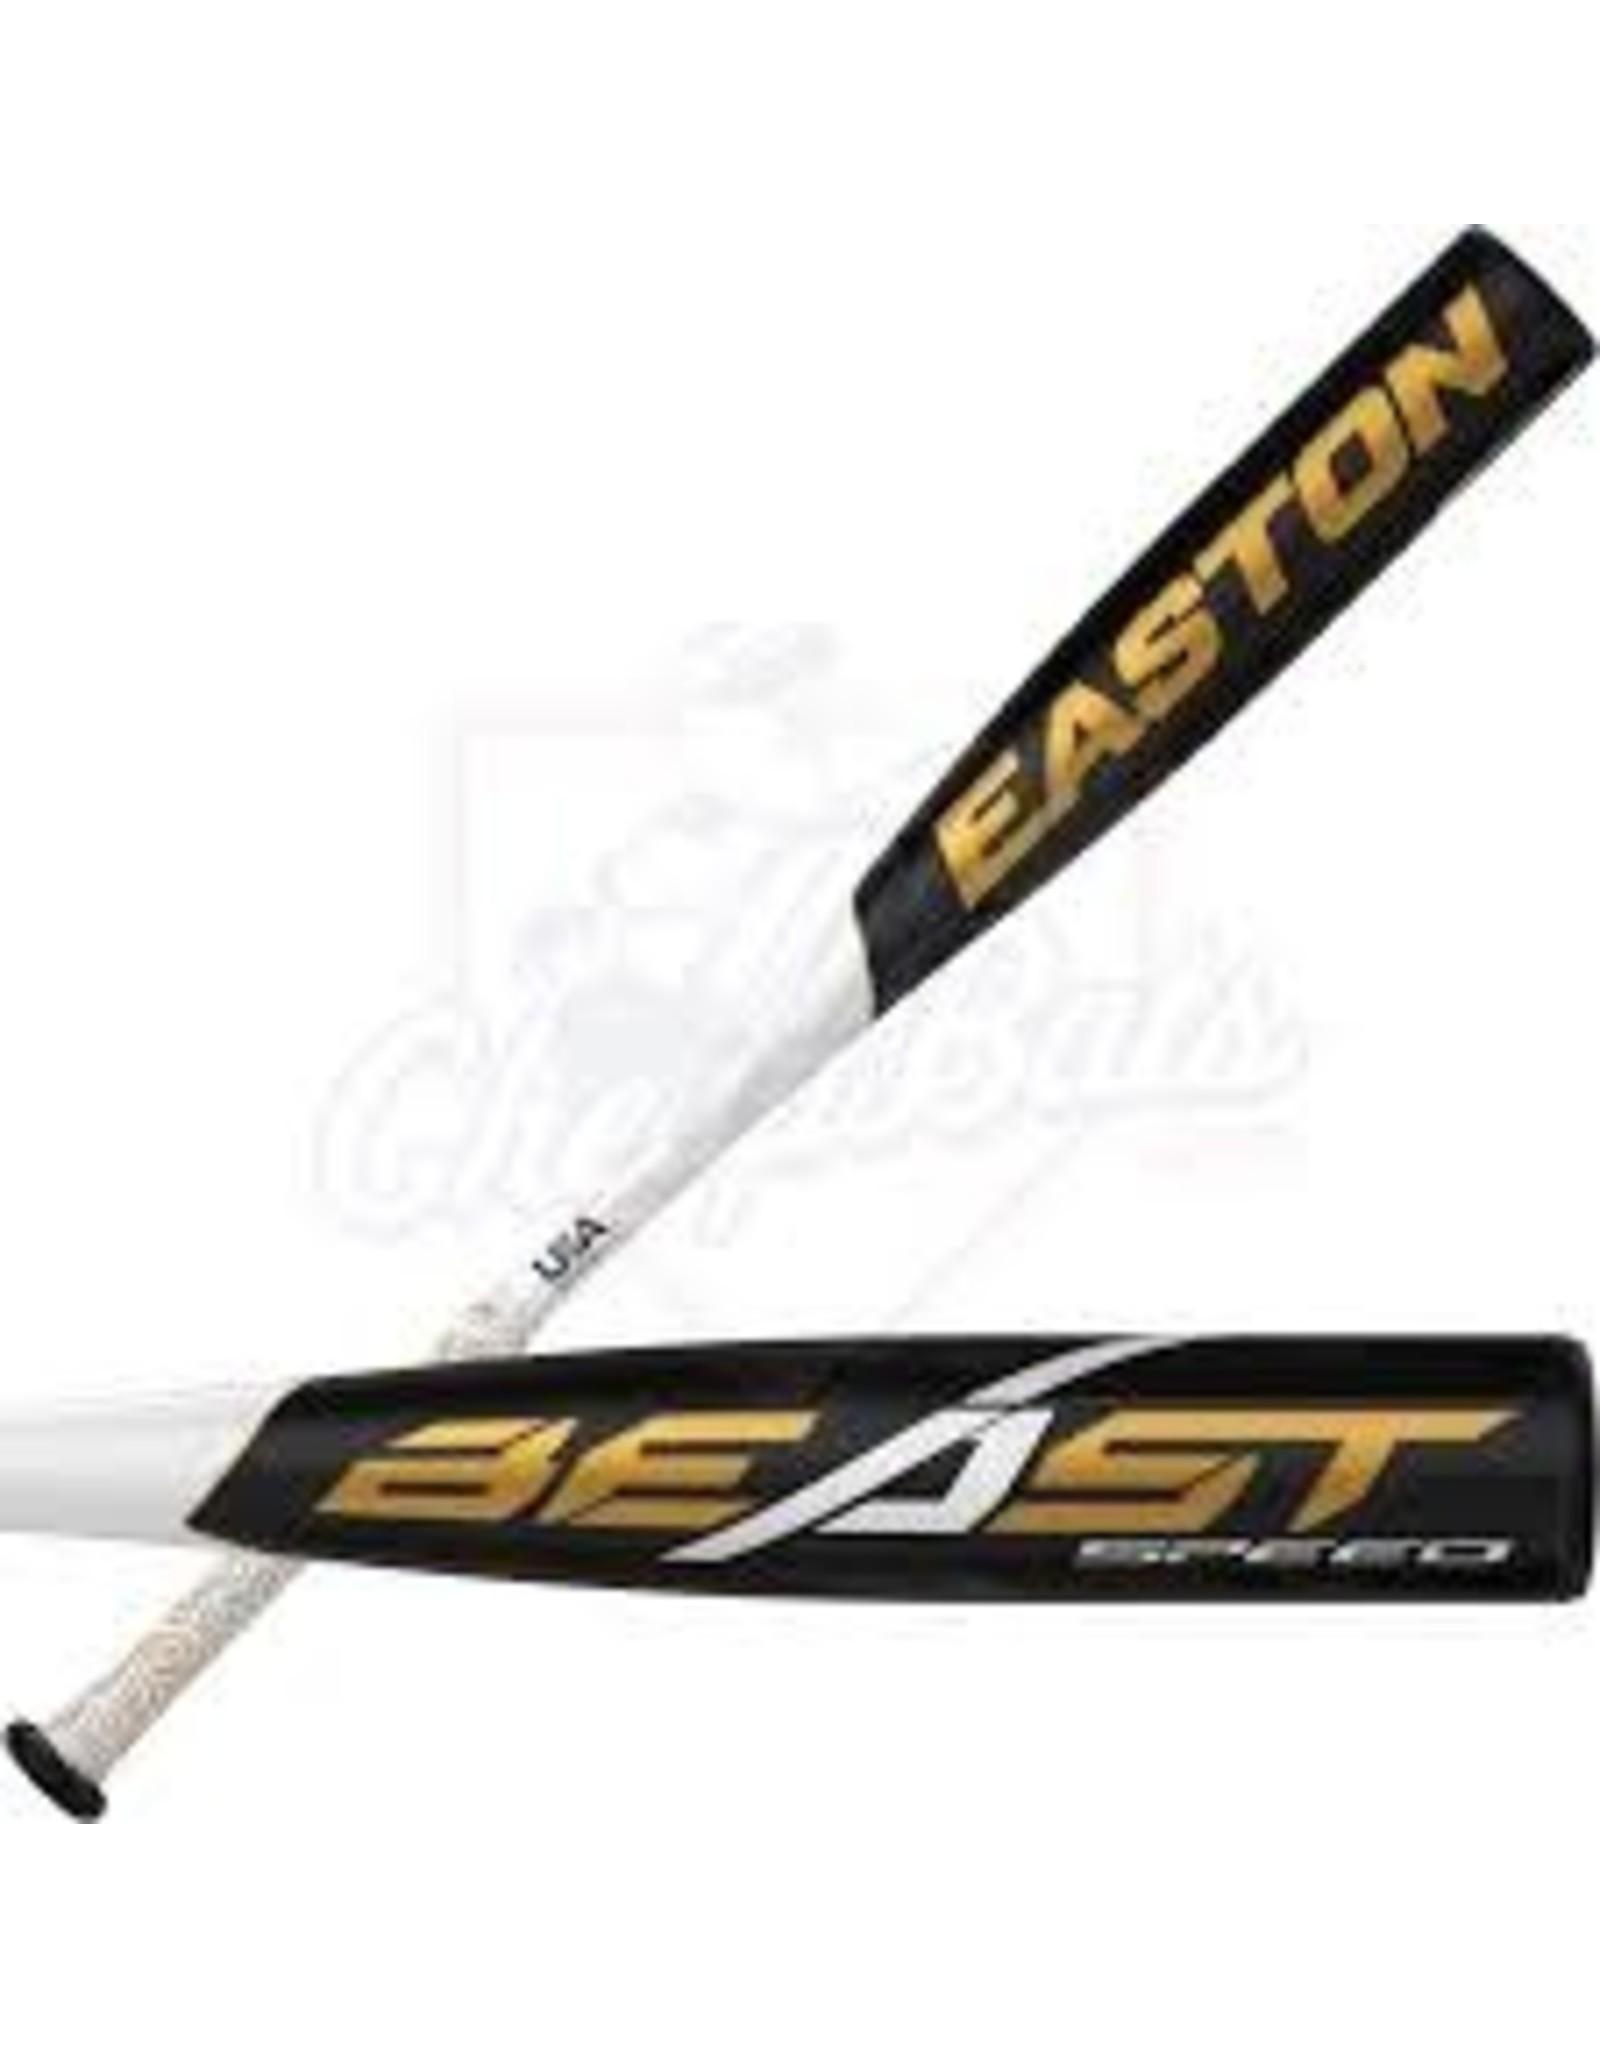 Easton - Beast Speed 2 3/4 30-10